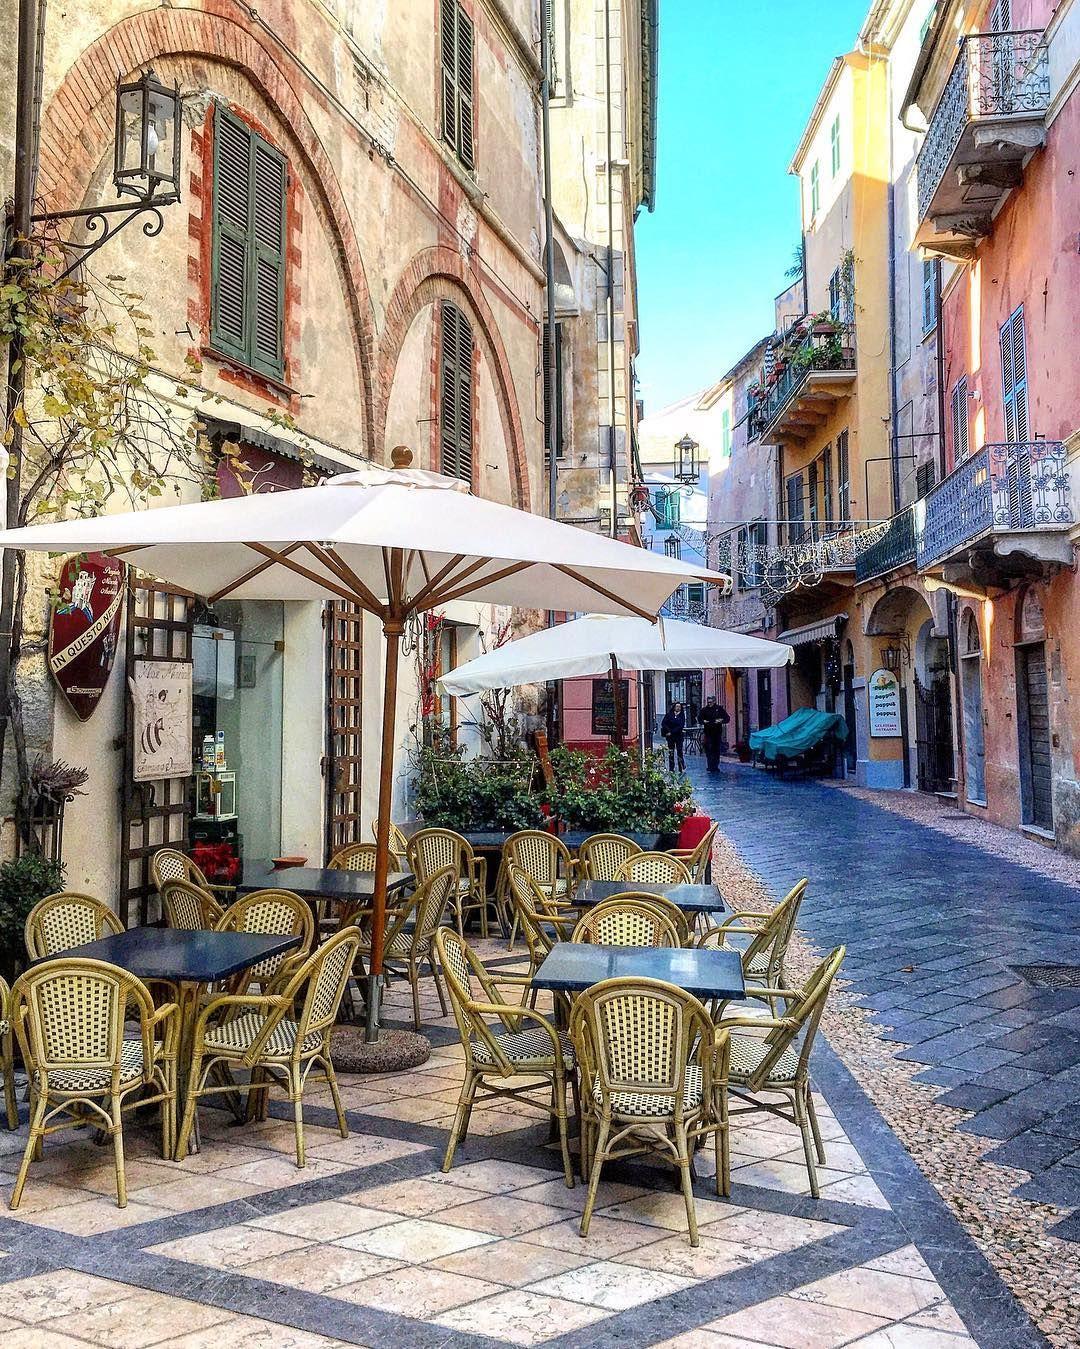 Noli Liguria Noli Savona Genova Liguria Italy Italia